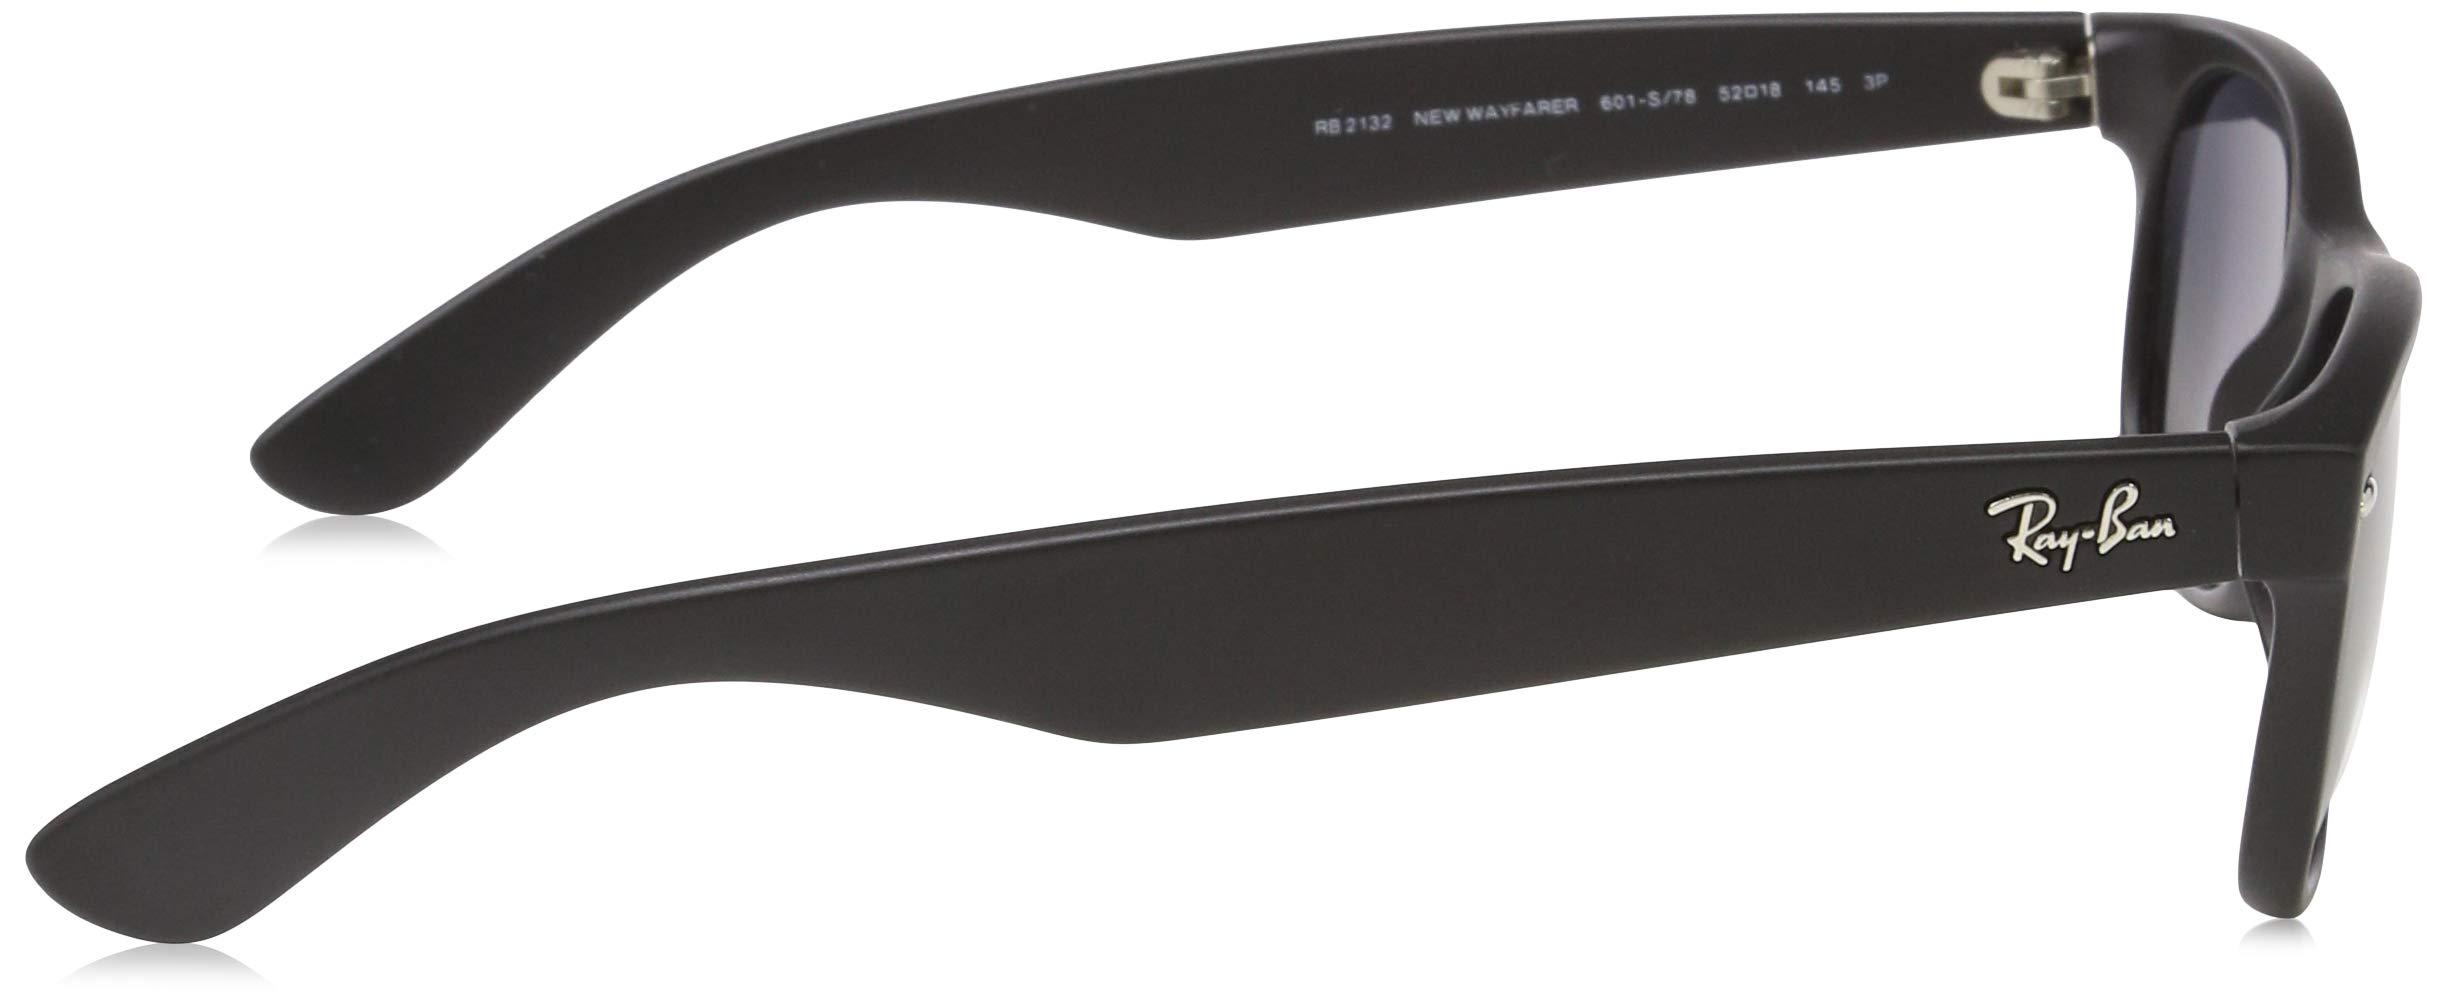 Ray-Ban Unisex New Wayfarer Polarized Sunglasses, Black/Polarized Blue/Grey Gradient, Blue Gradient Grey, 55mm by Ray-Ban (Image #3)